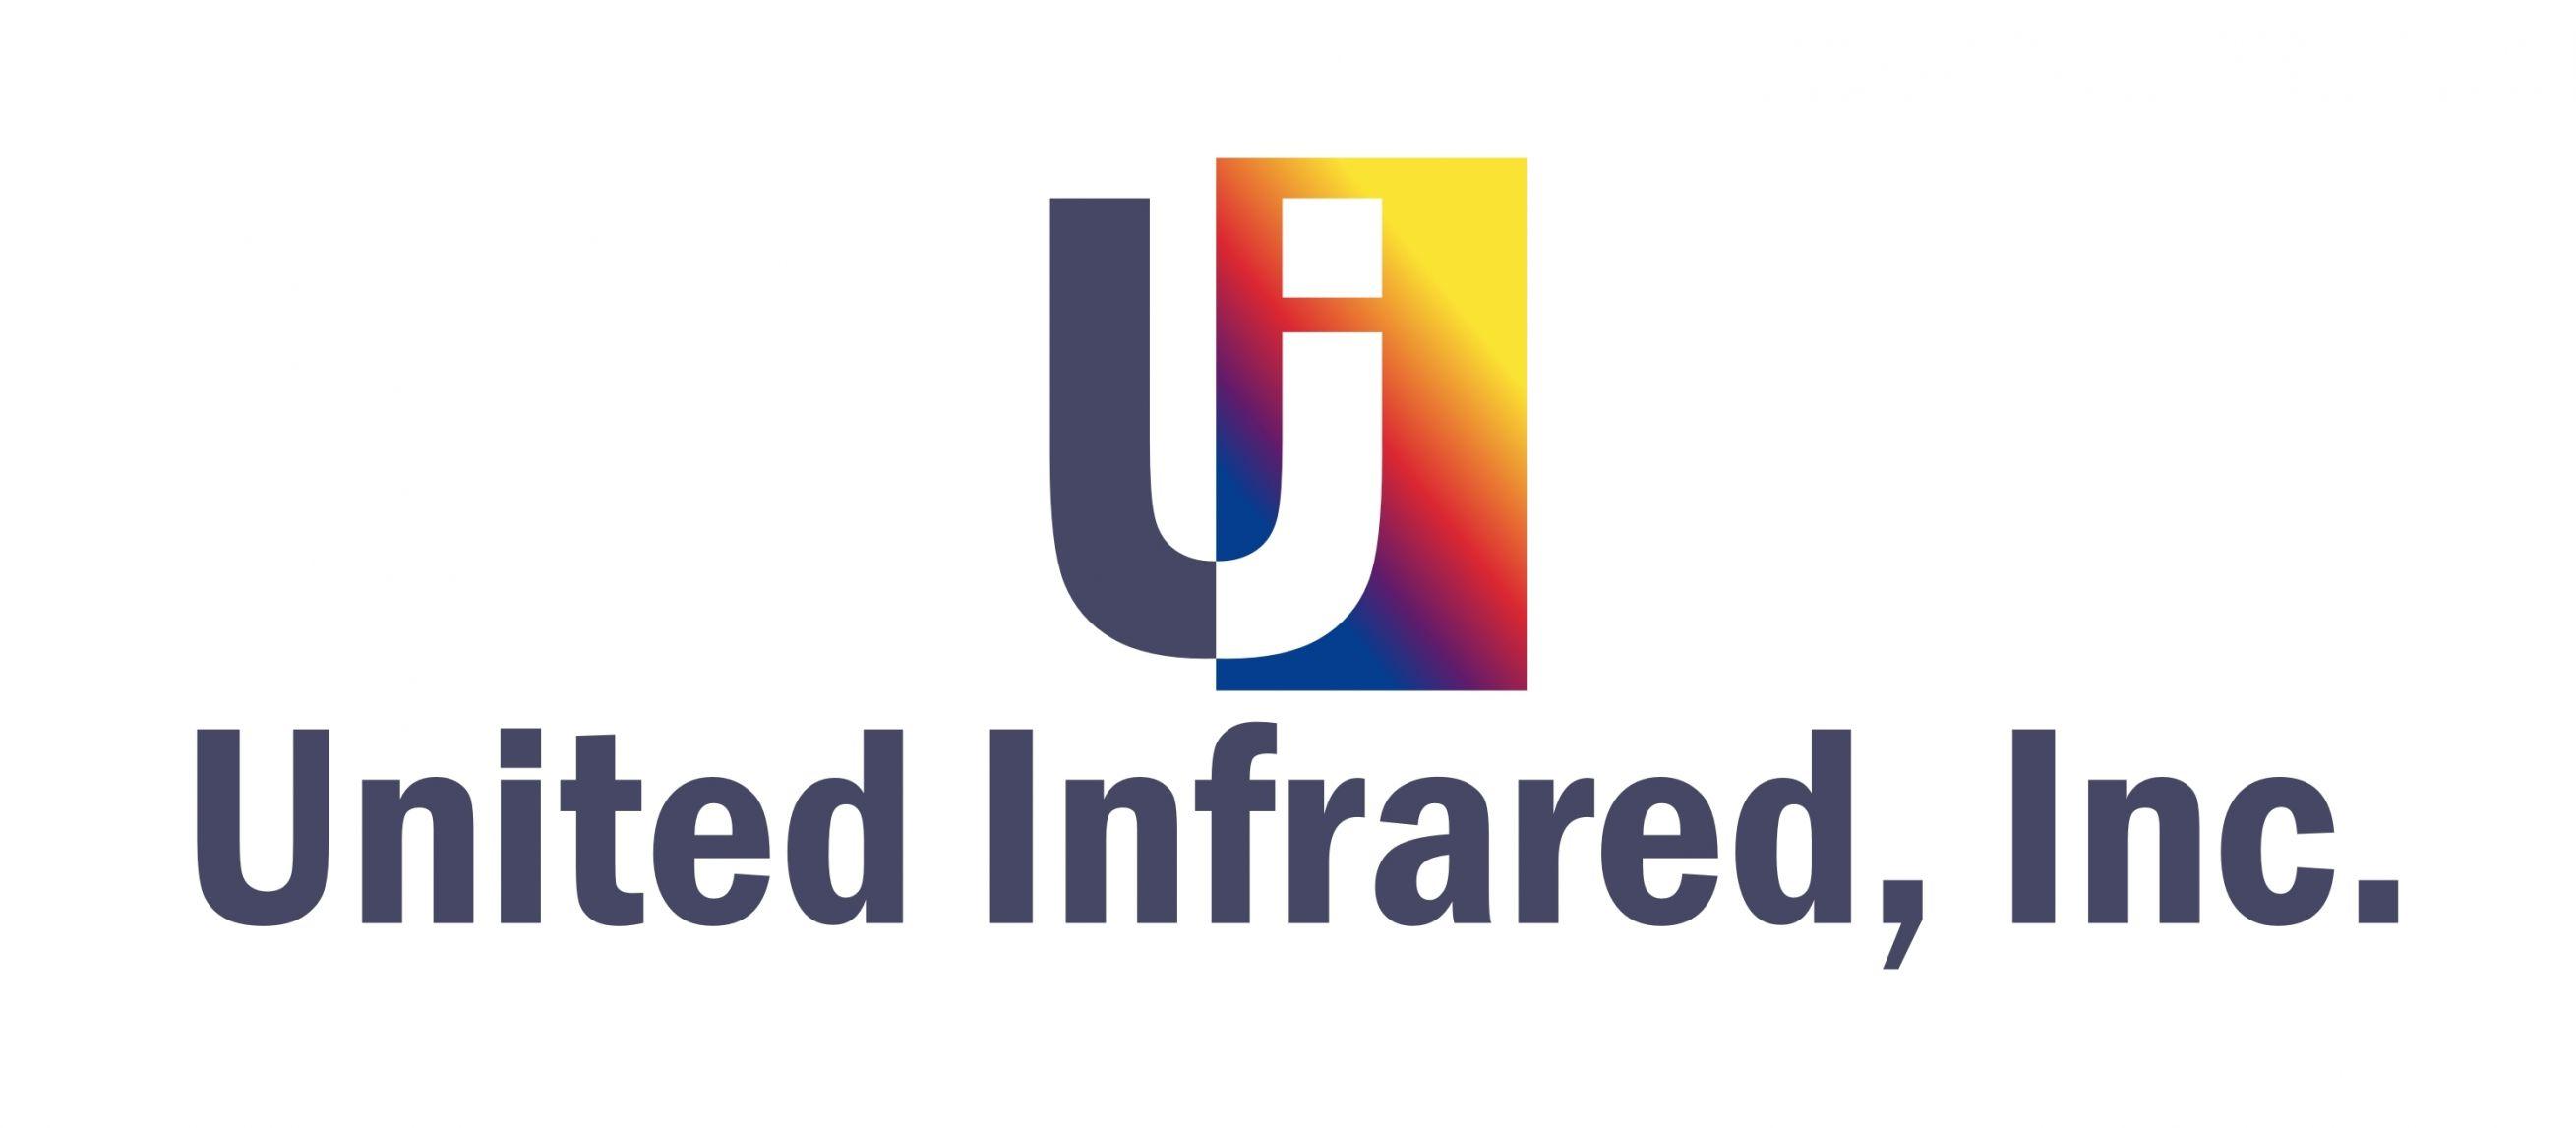 UnitedInfraredInc Logo